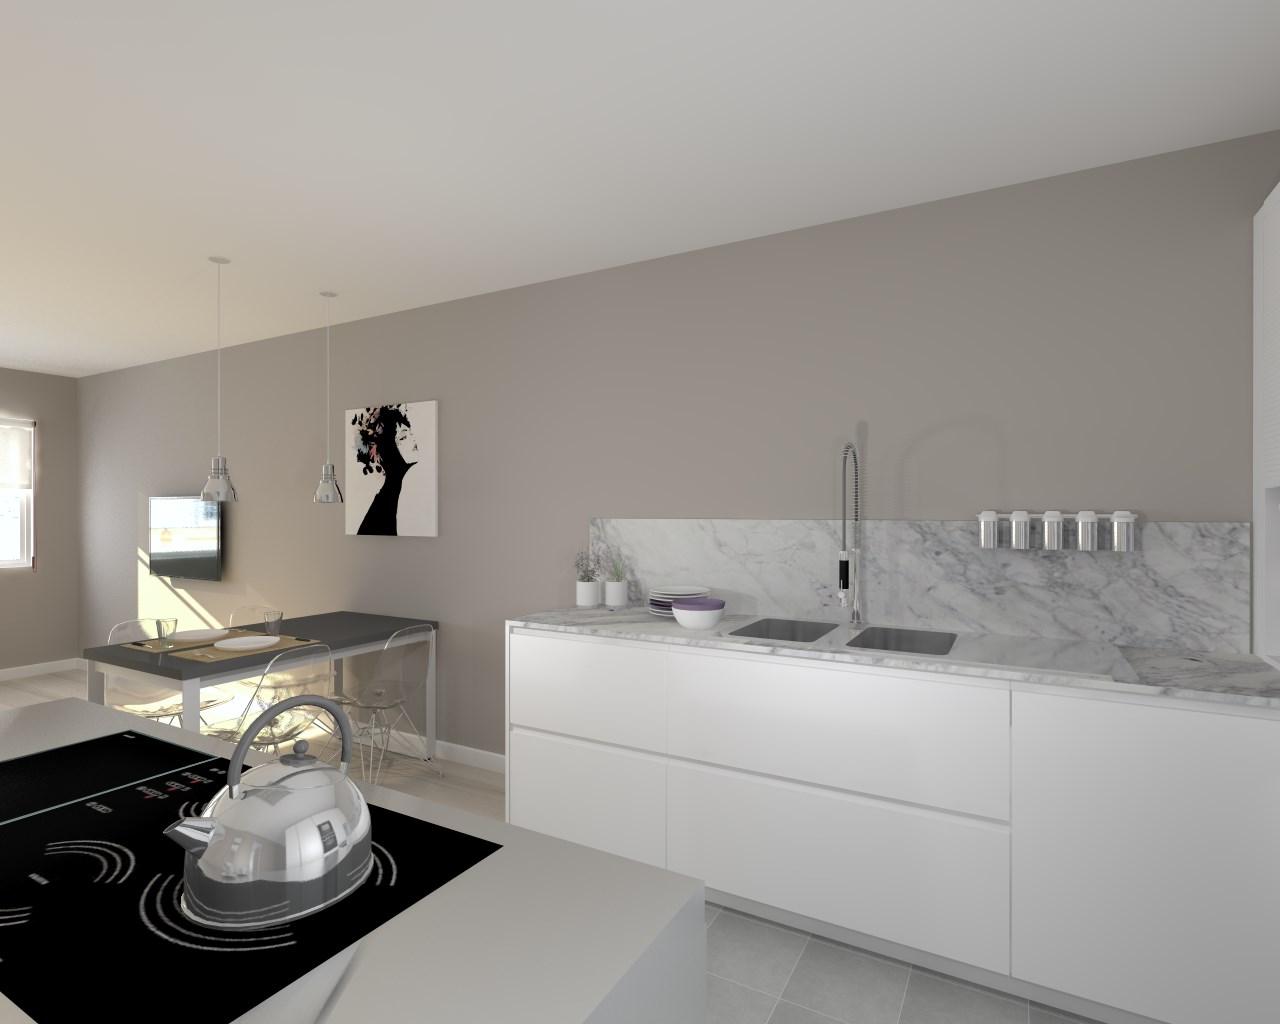 cocina santos modelo line blanco encimera granito portobello